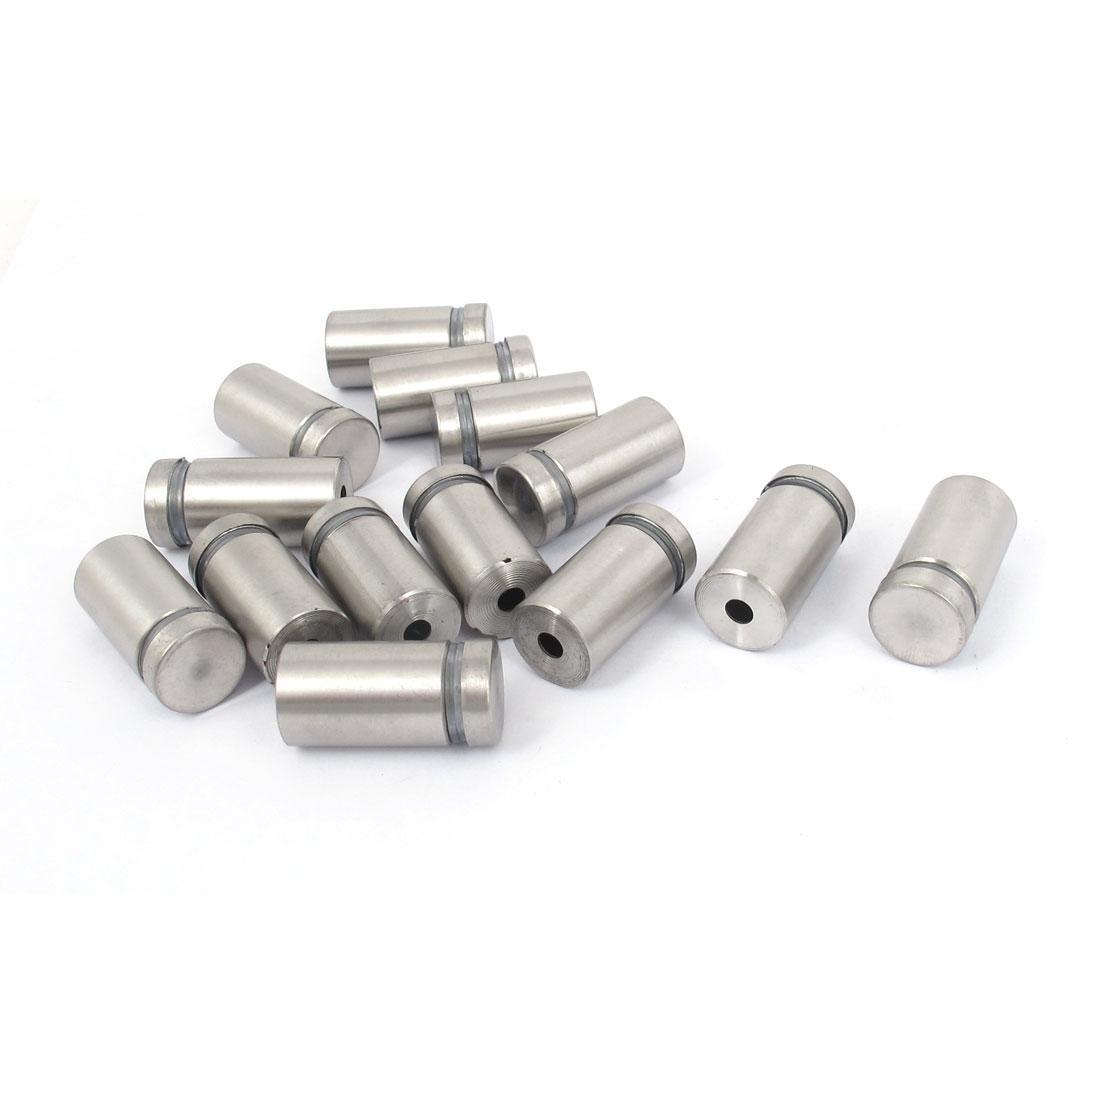 16mm x 30mm Stainless Steel Advertising Frameless Glass Standoff Pins 14pcs